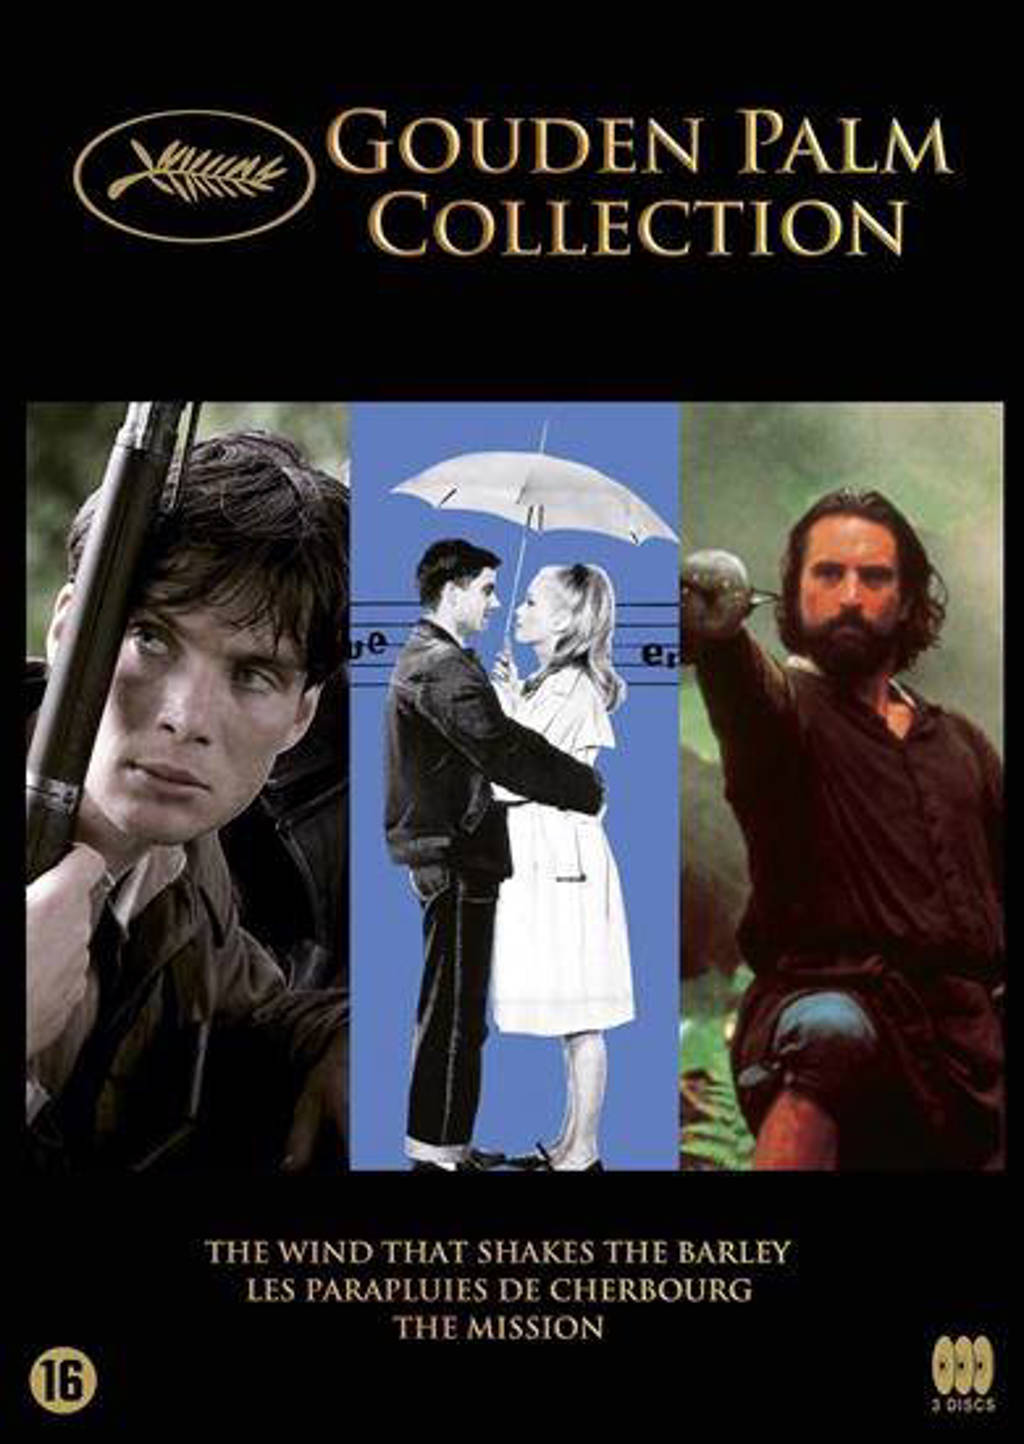 Gouden palm collection (DVD)